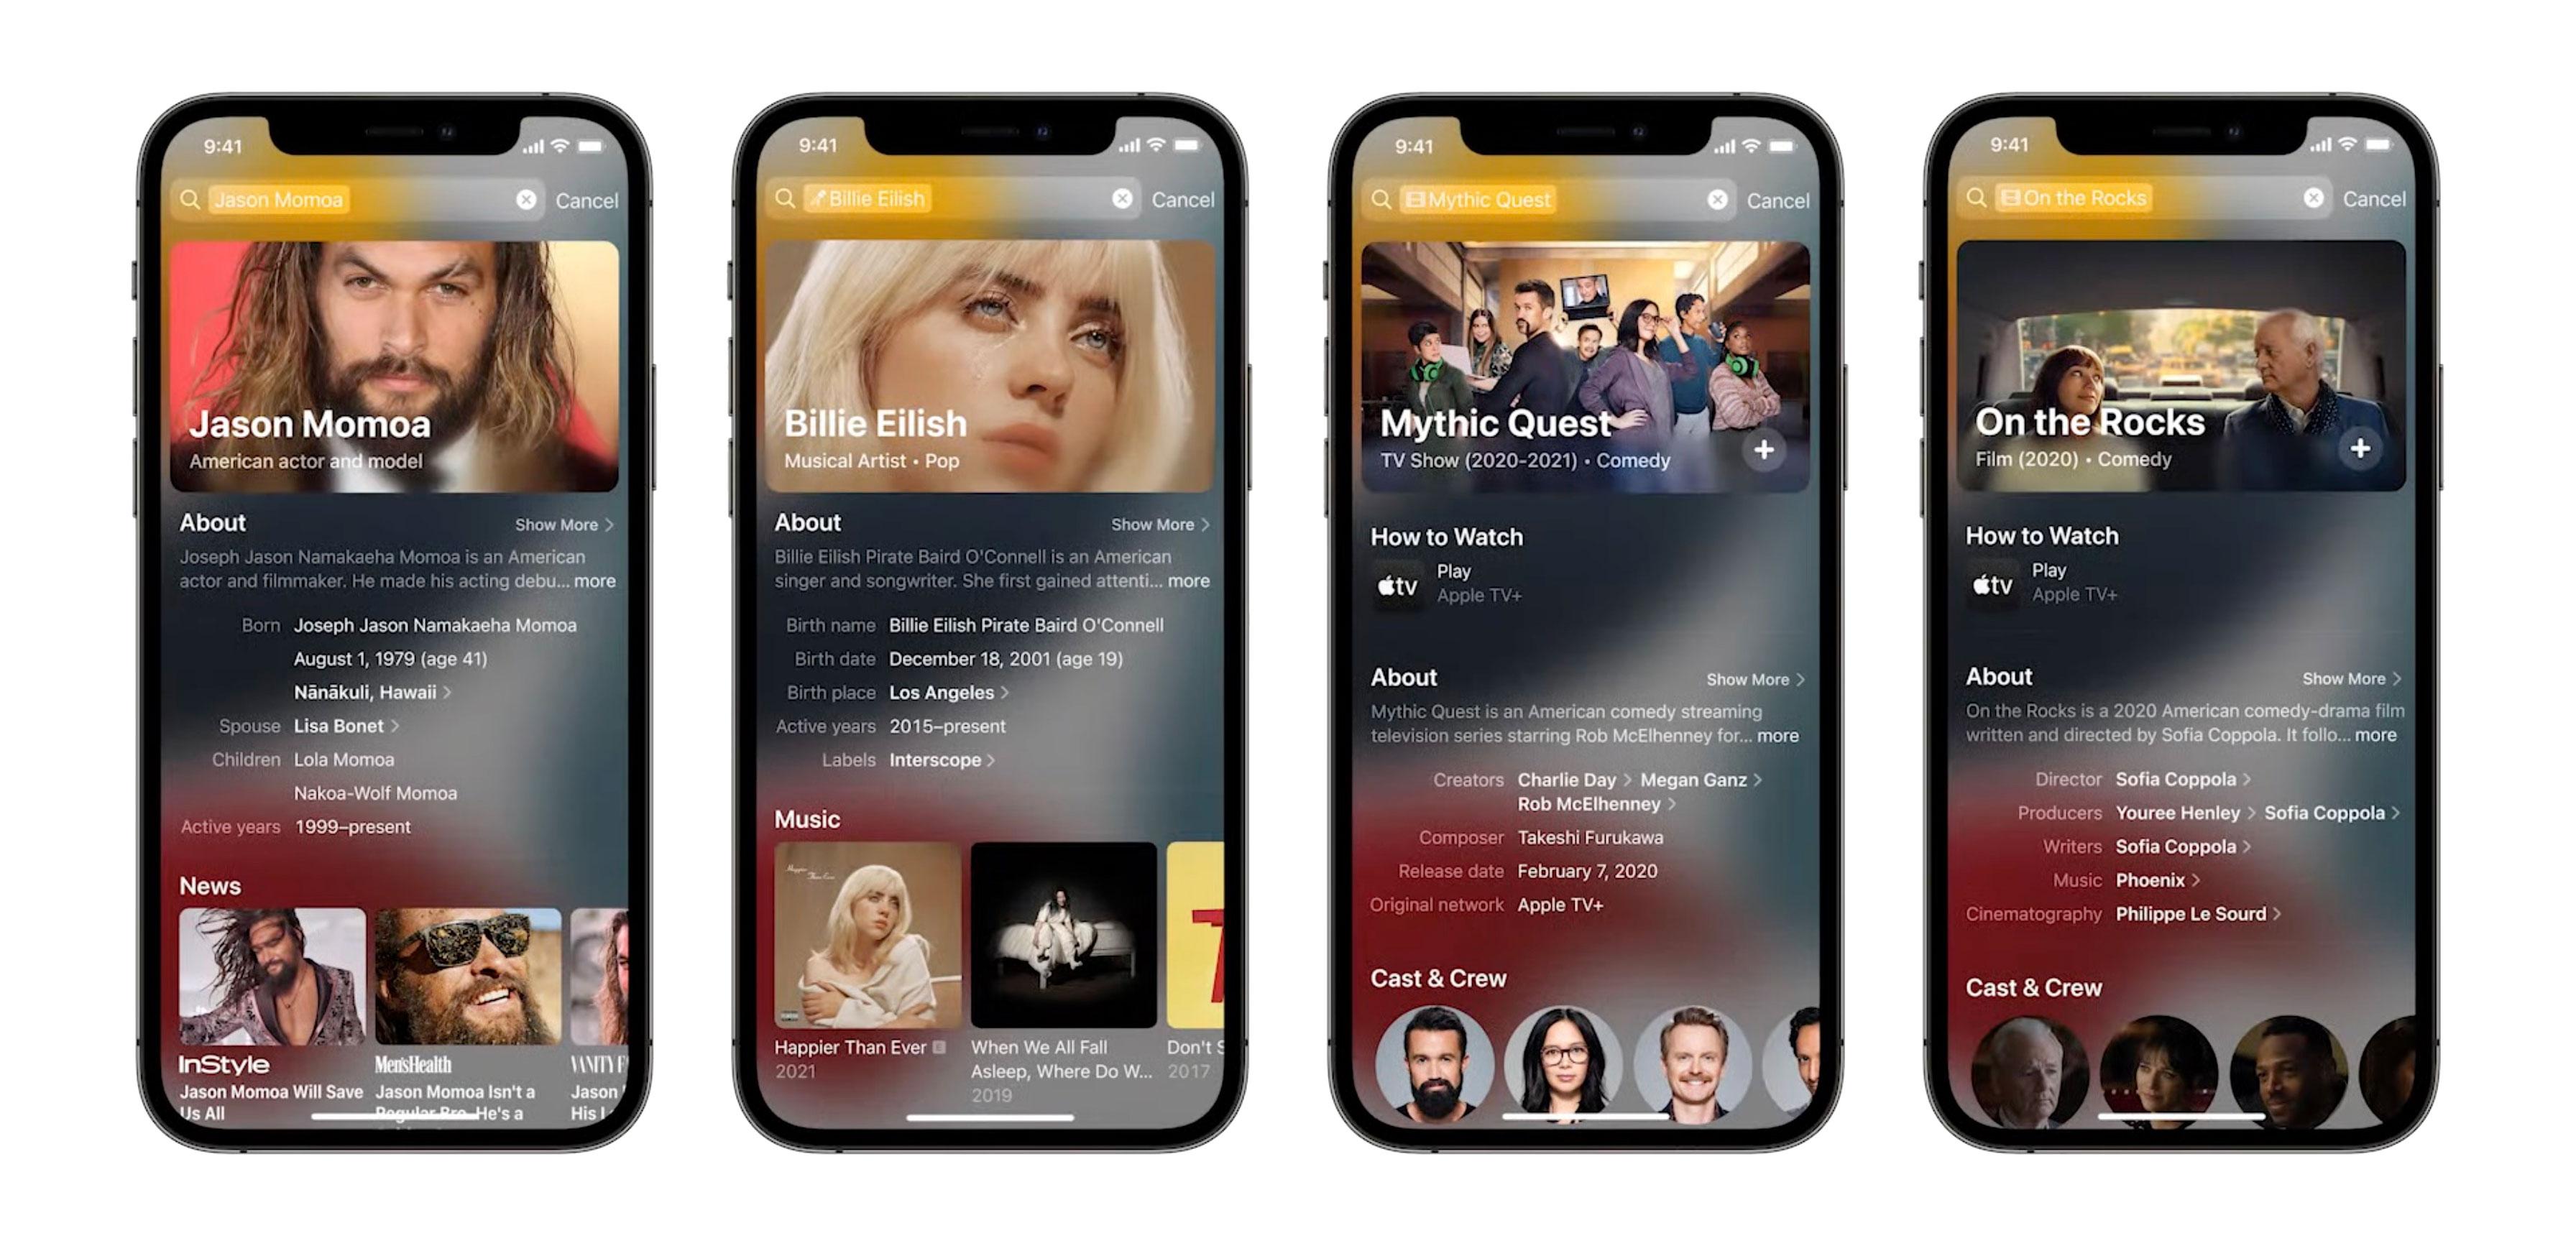 https://www.macfreak.nl/modules/news/images/zArt.iOS15SpotlightRichSearchResults.jpg